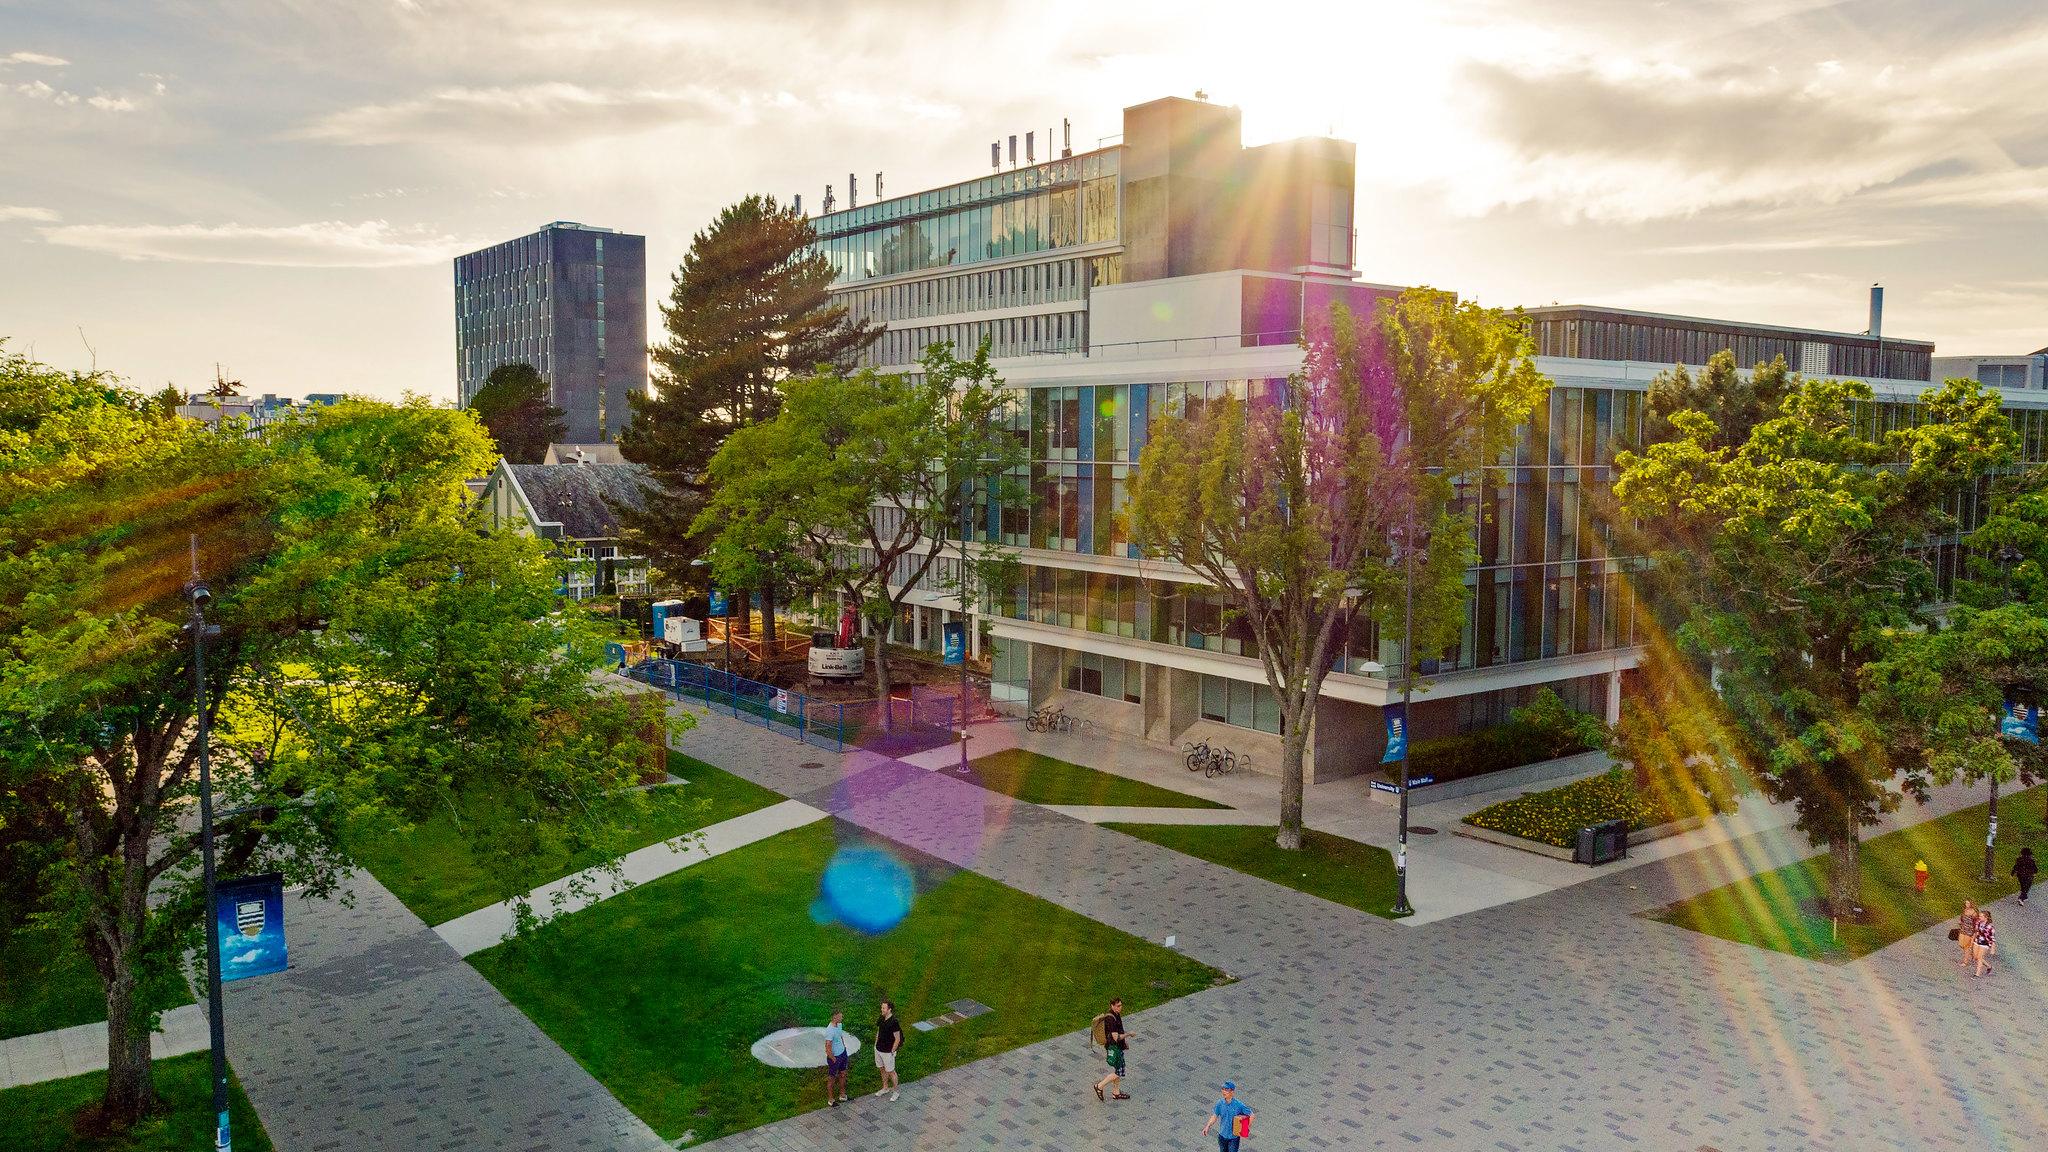 The University of British Columbia's Sauder School